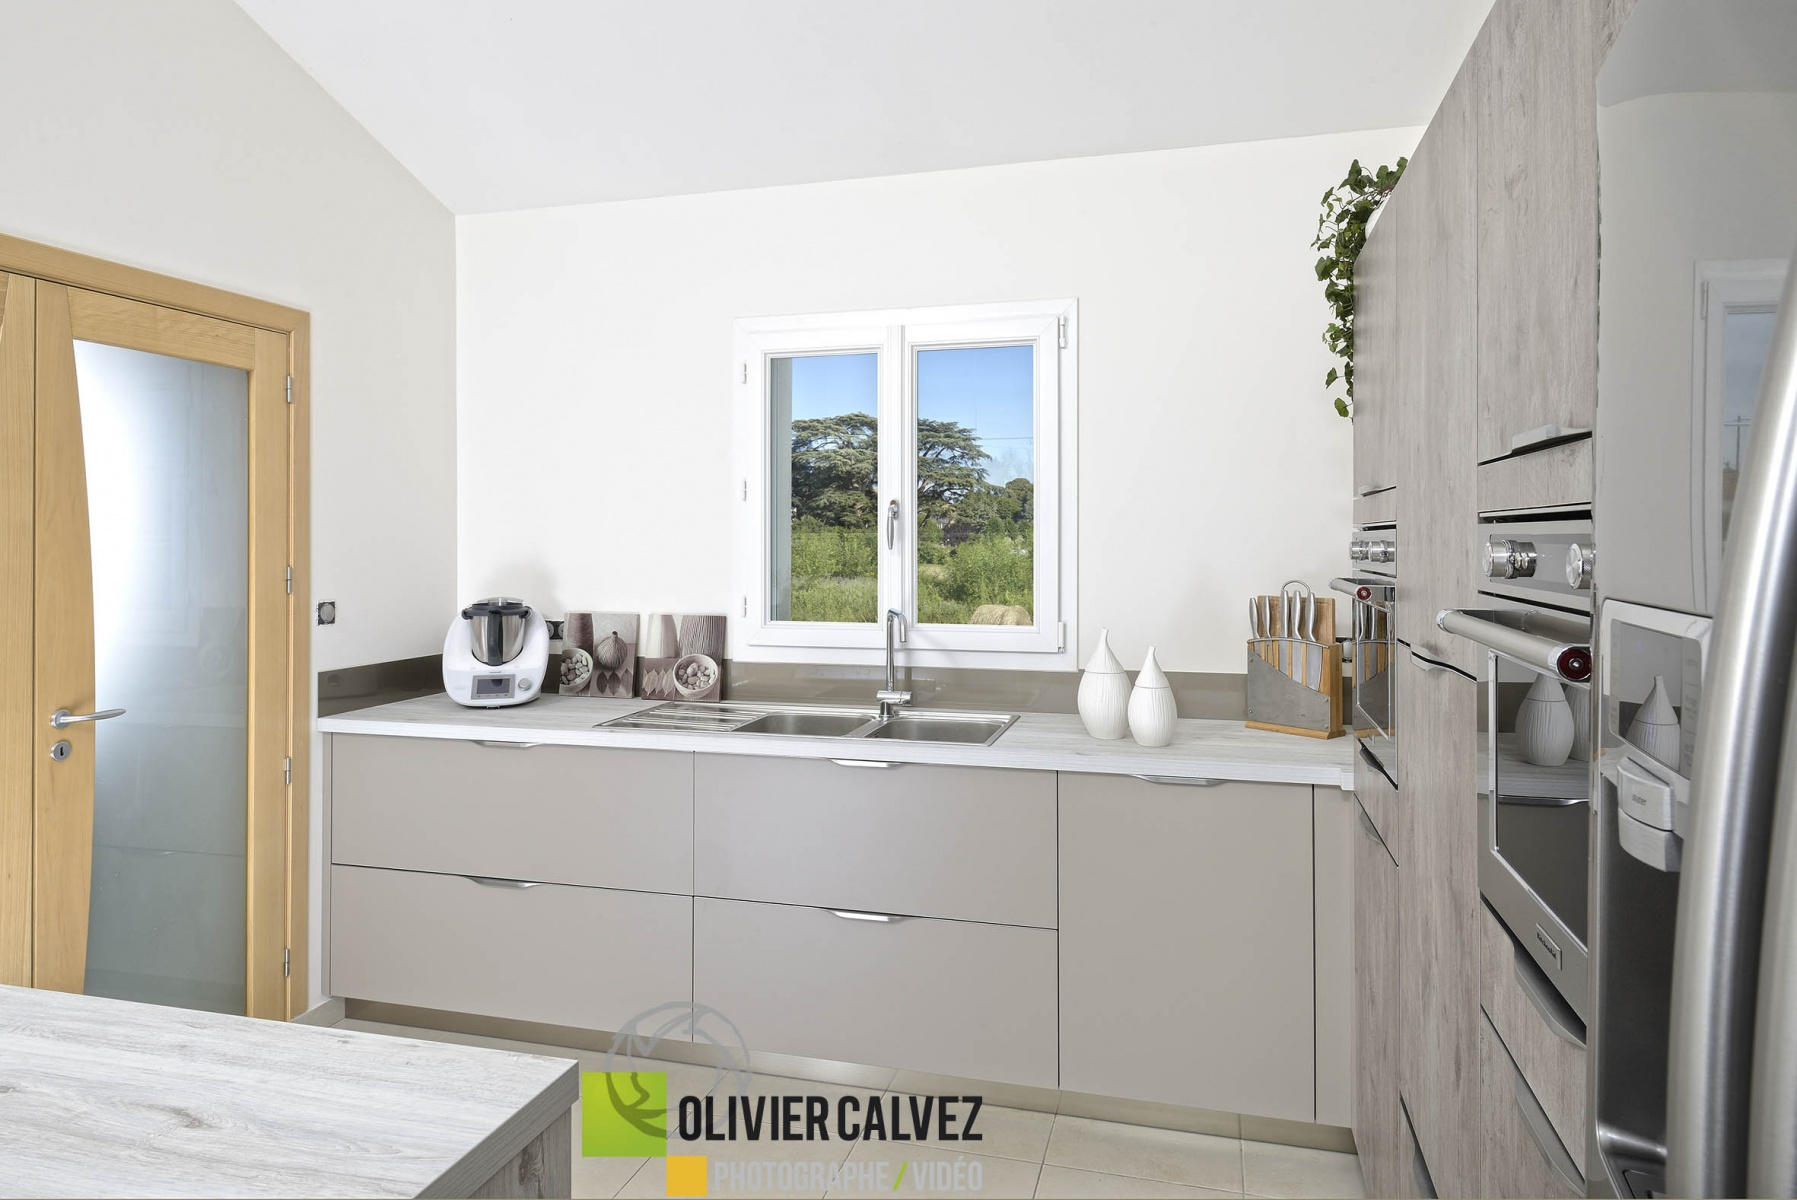 OLIVIER CALVEZ - PYRAM INDUSTRIE - CUISINE